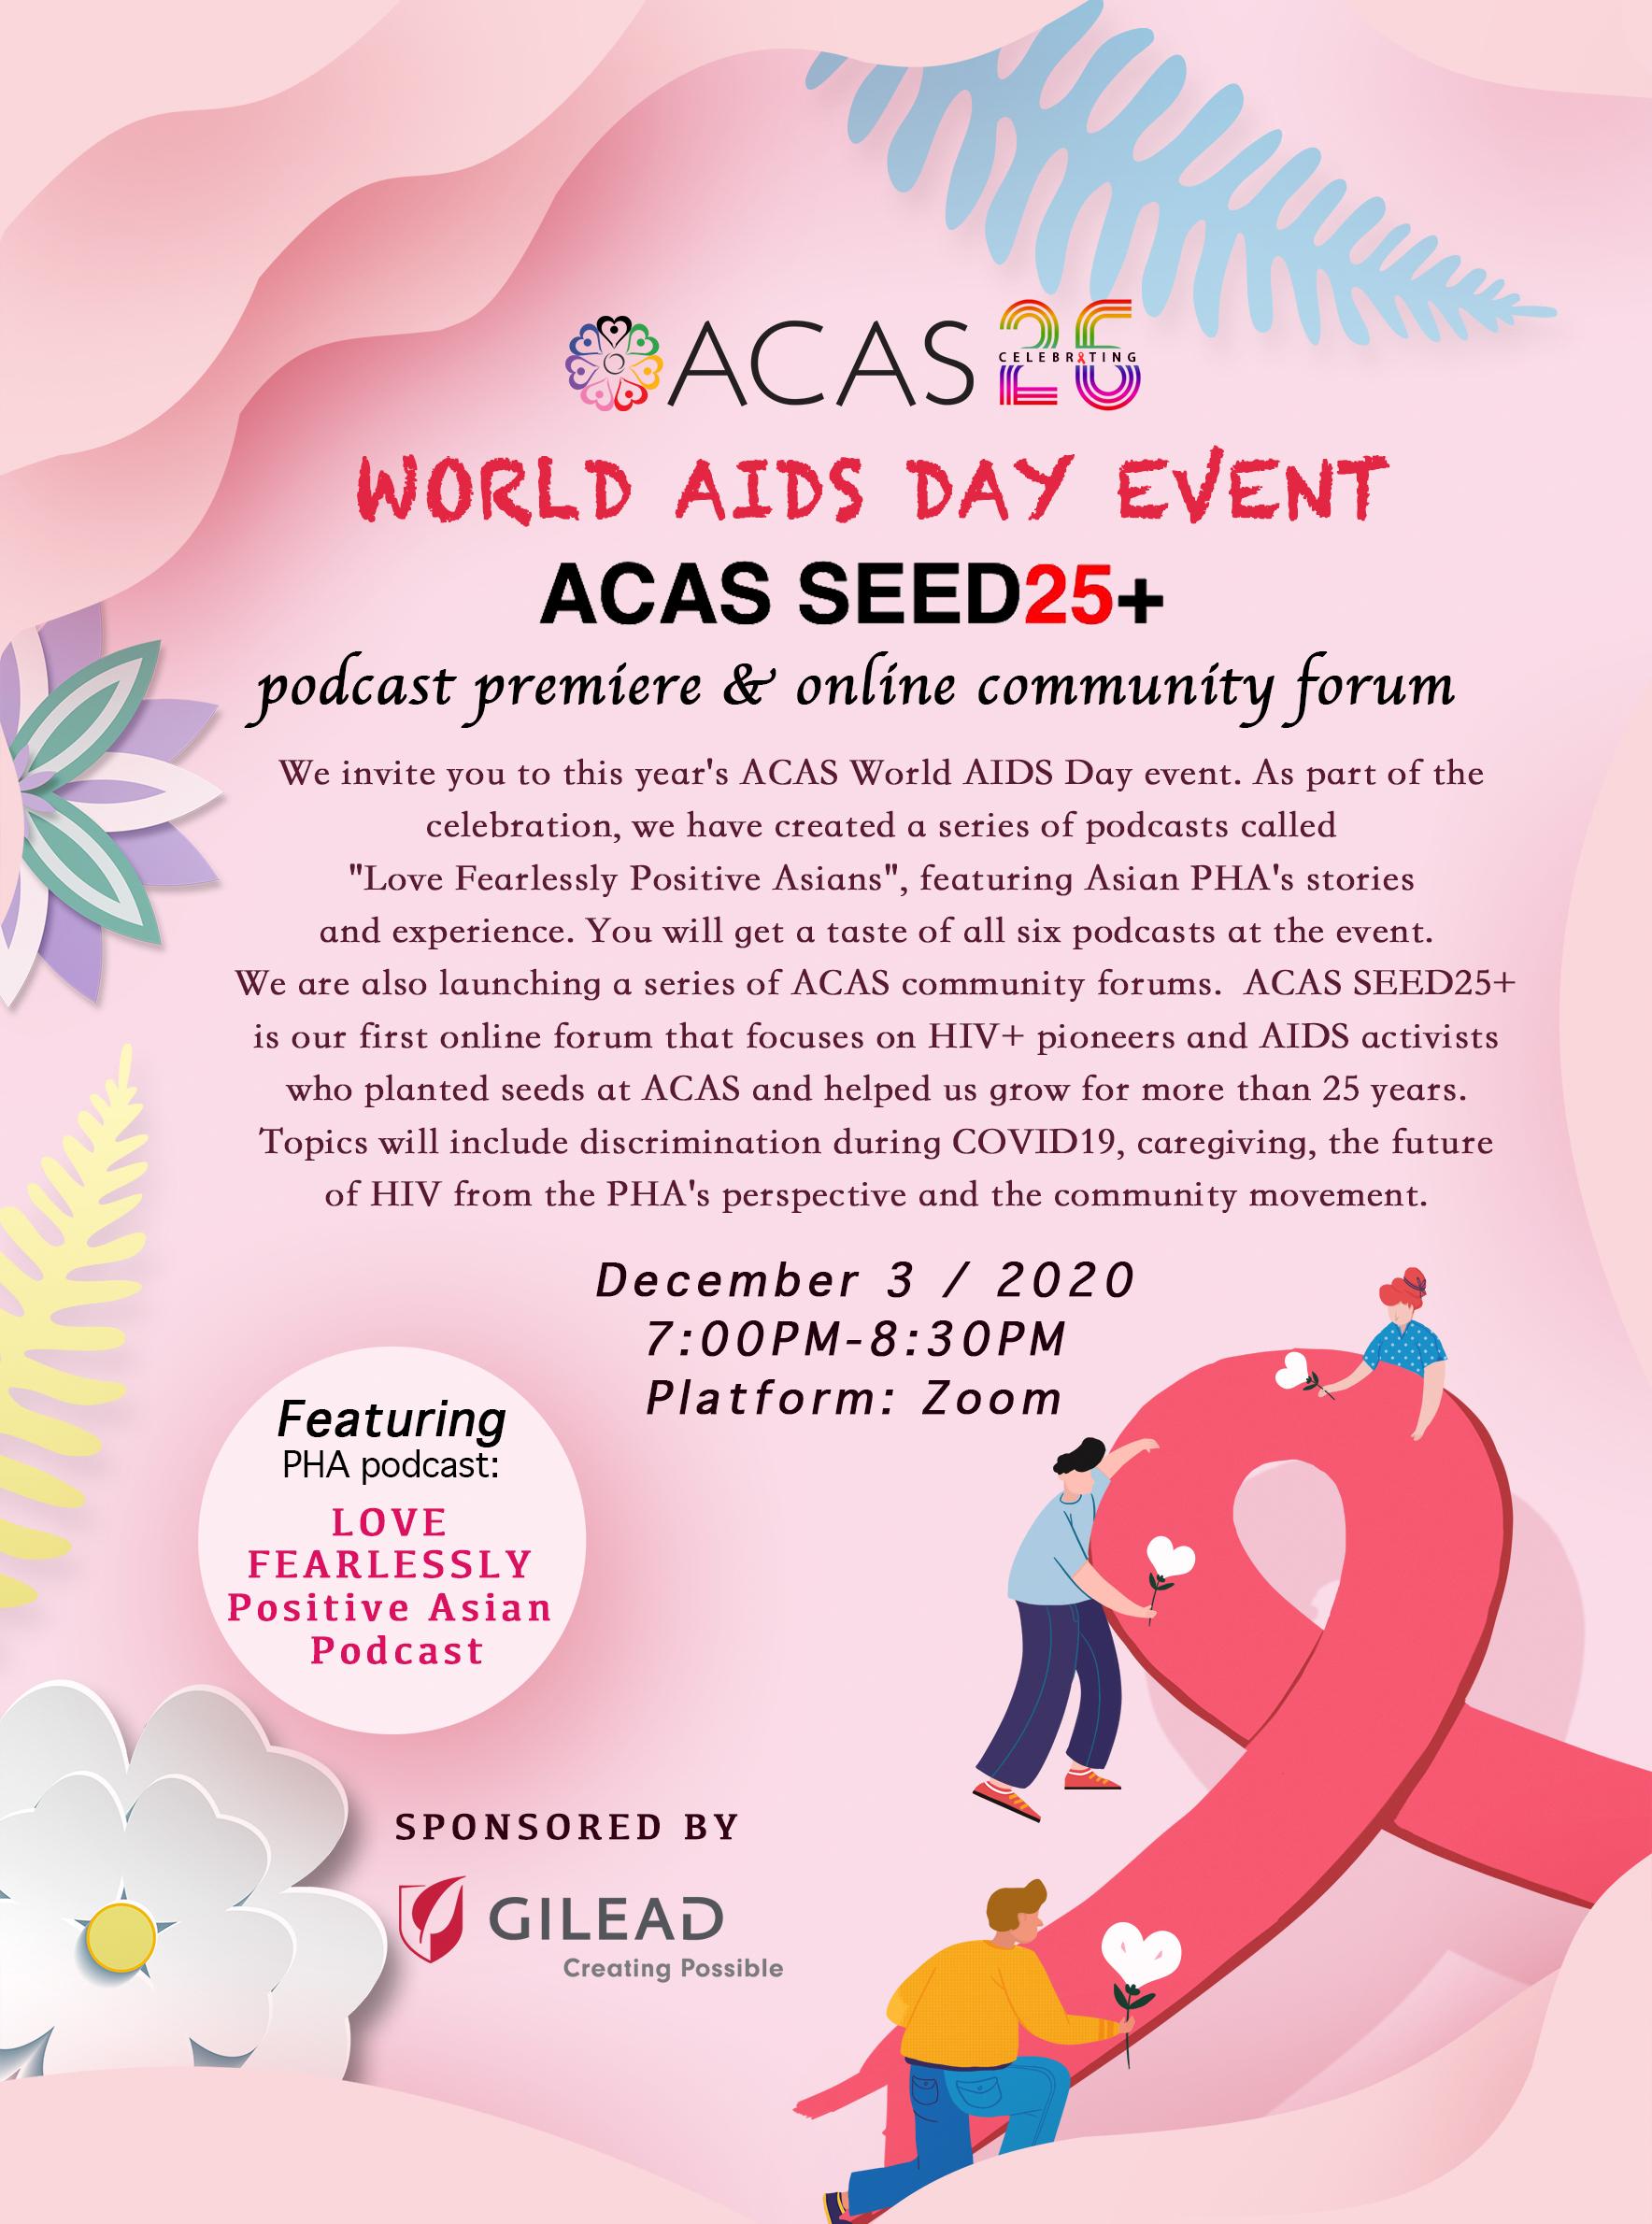 ACAS World AIDS Day event poster